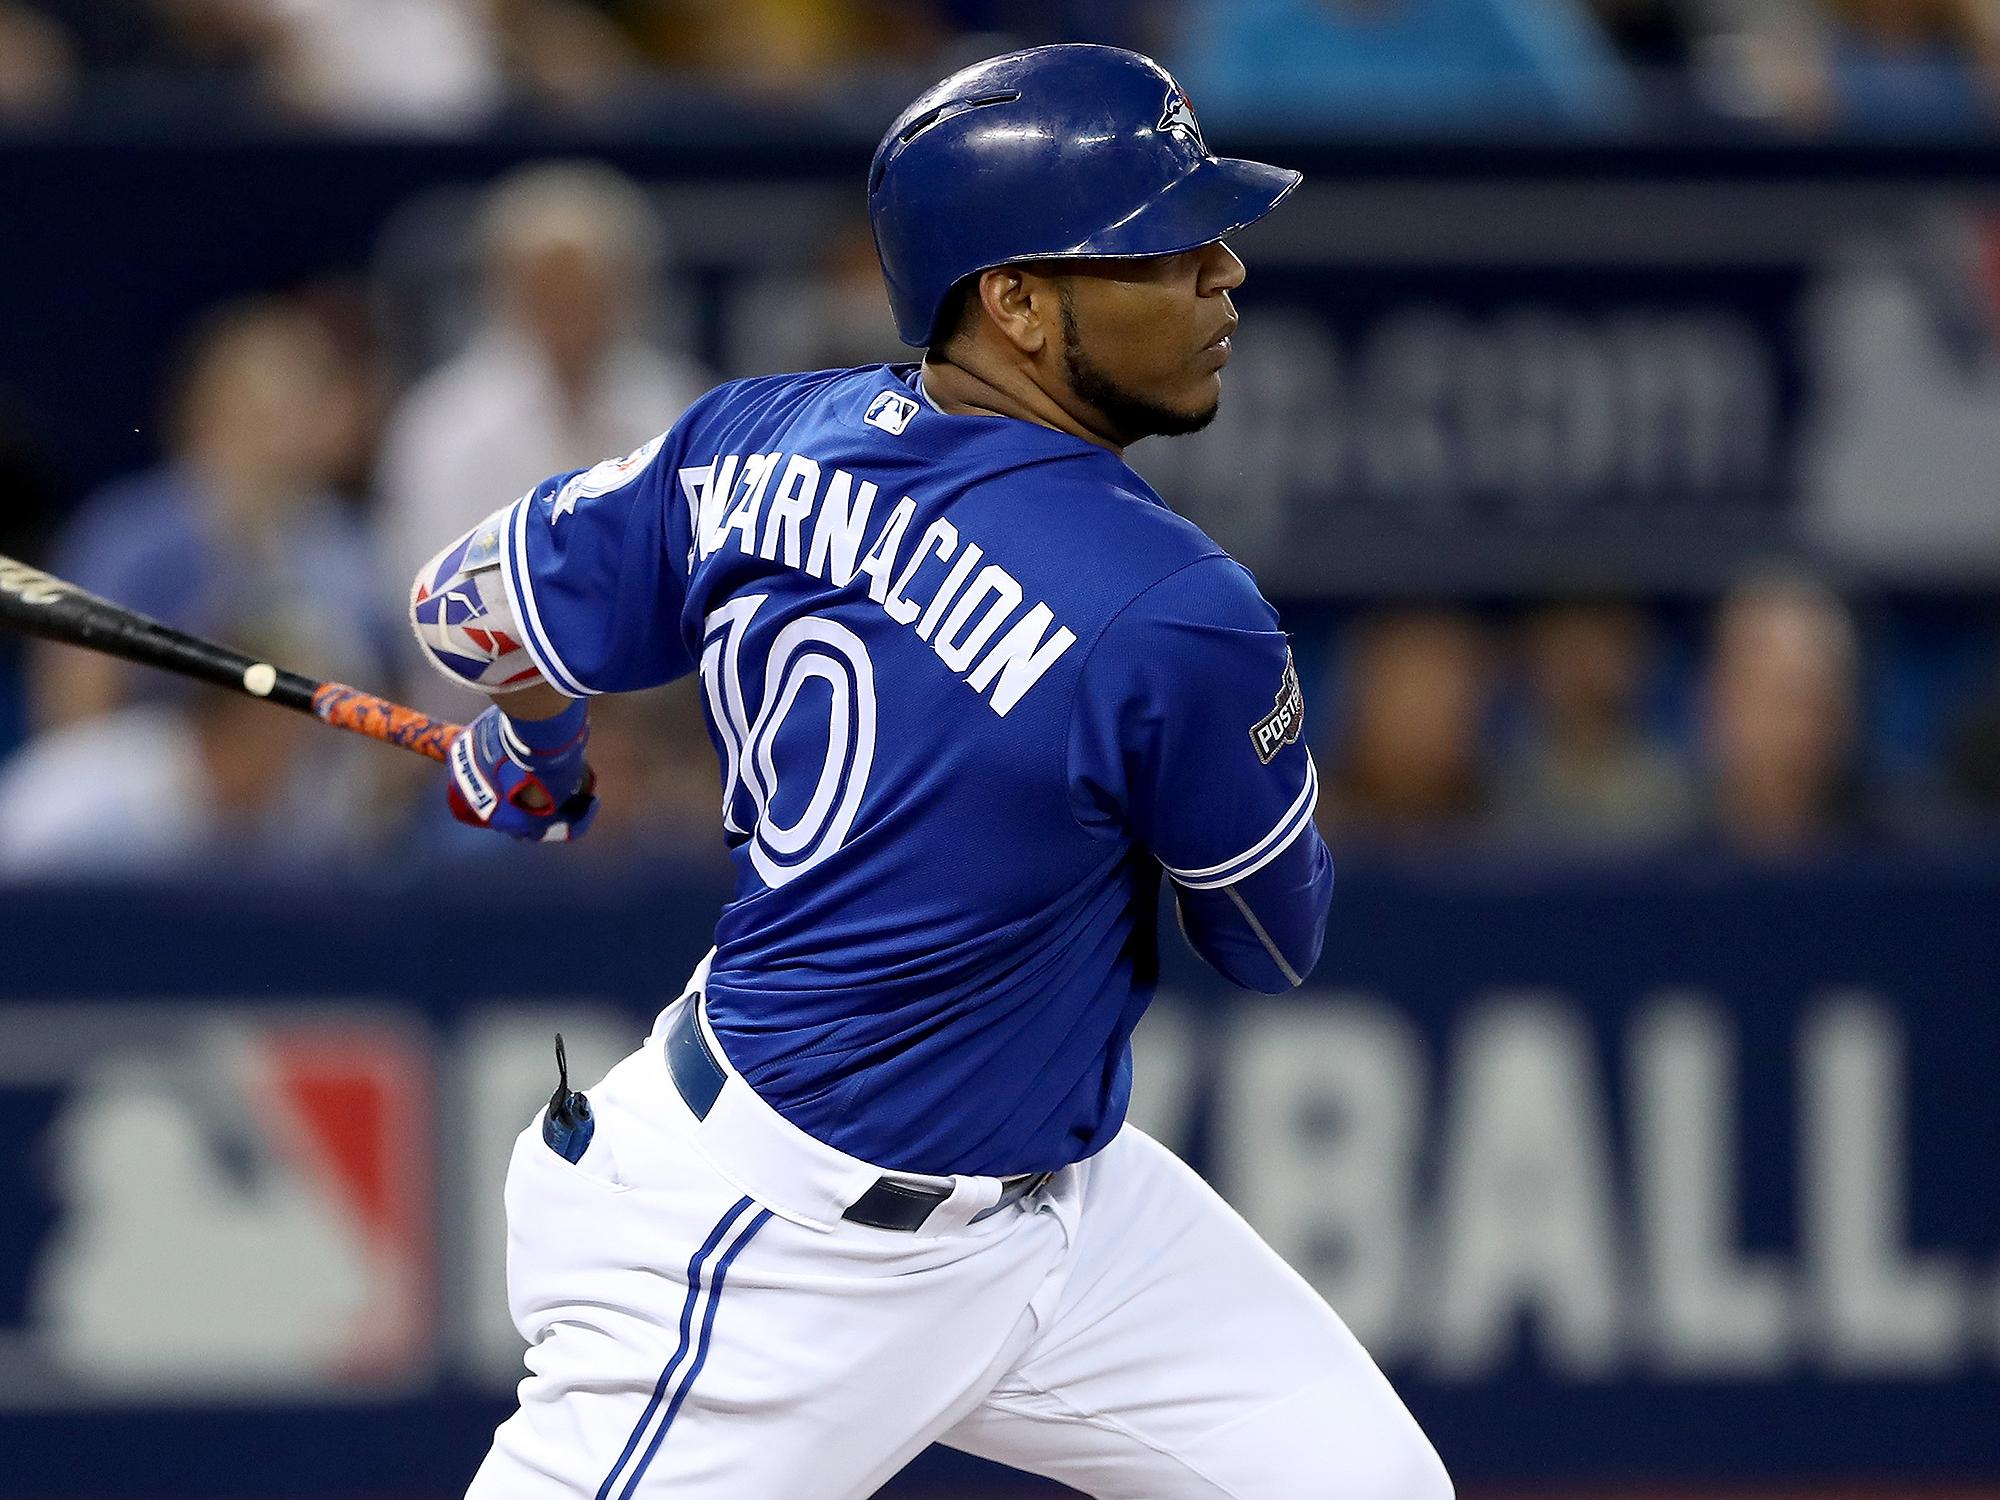 Toronto Blue Jays Edwin Encarnacion